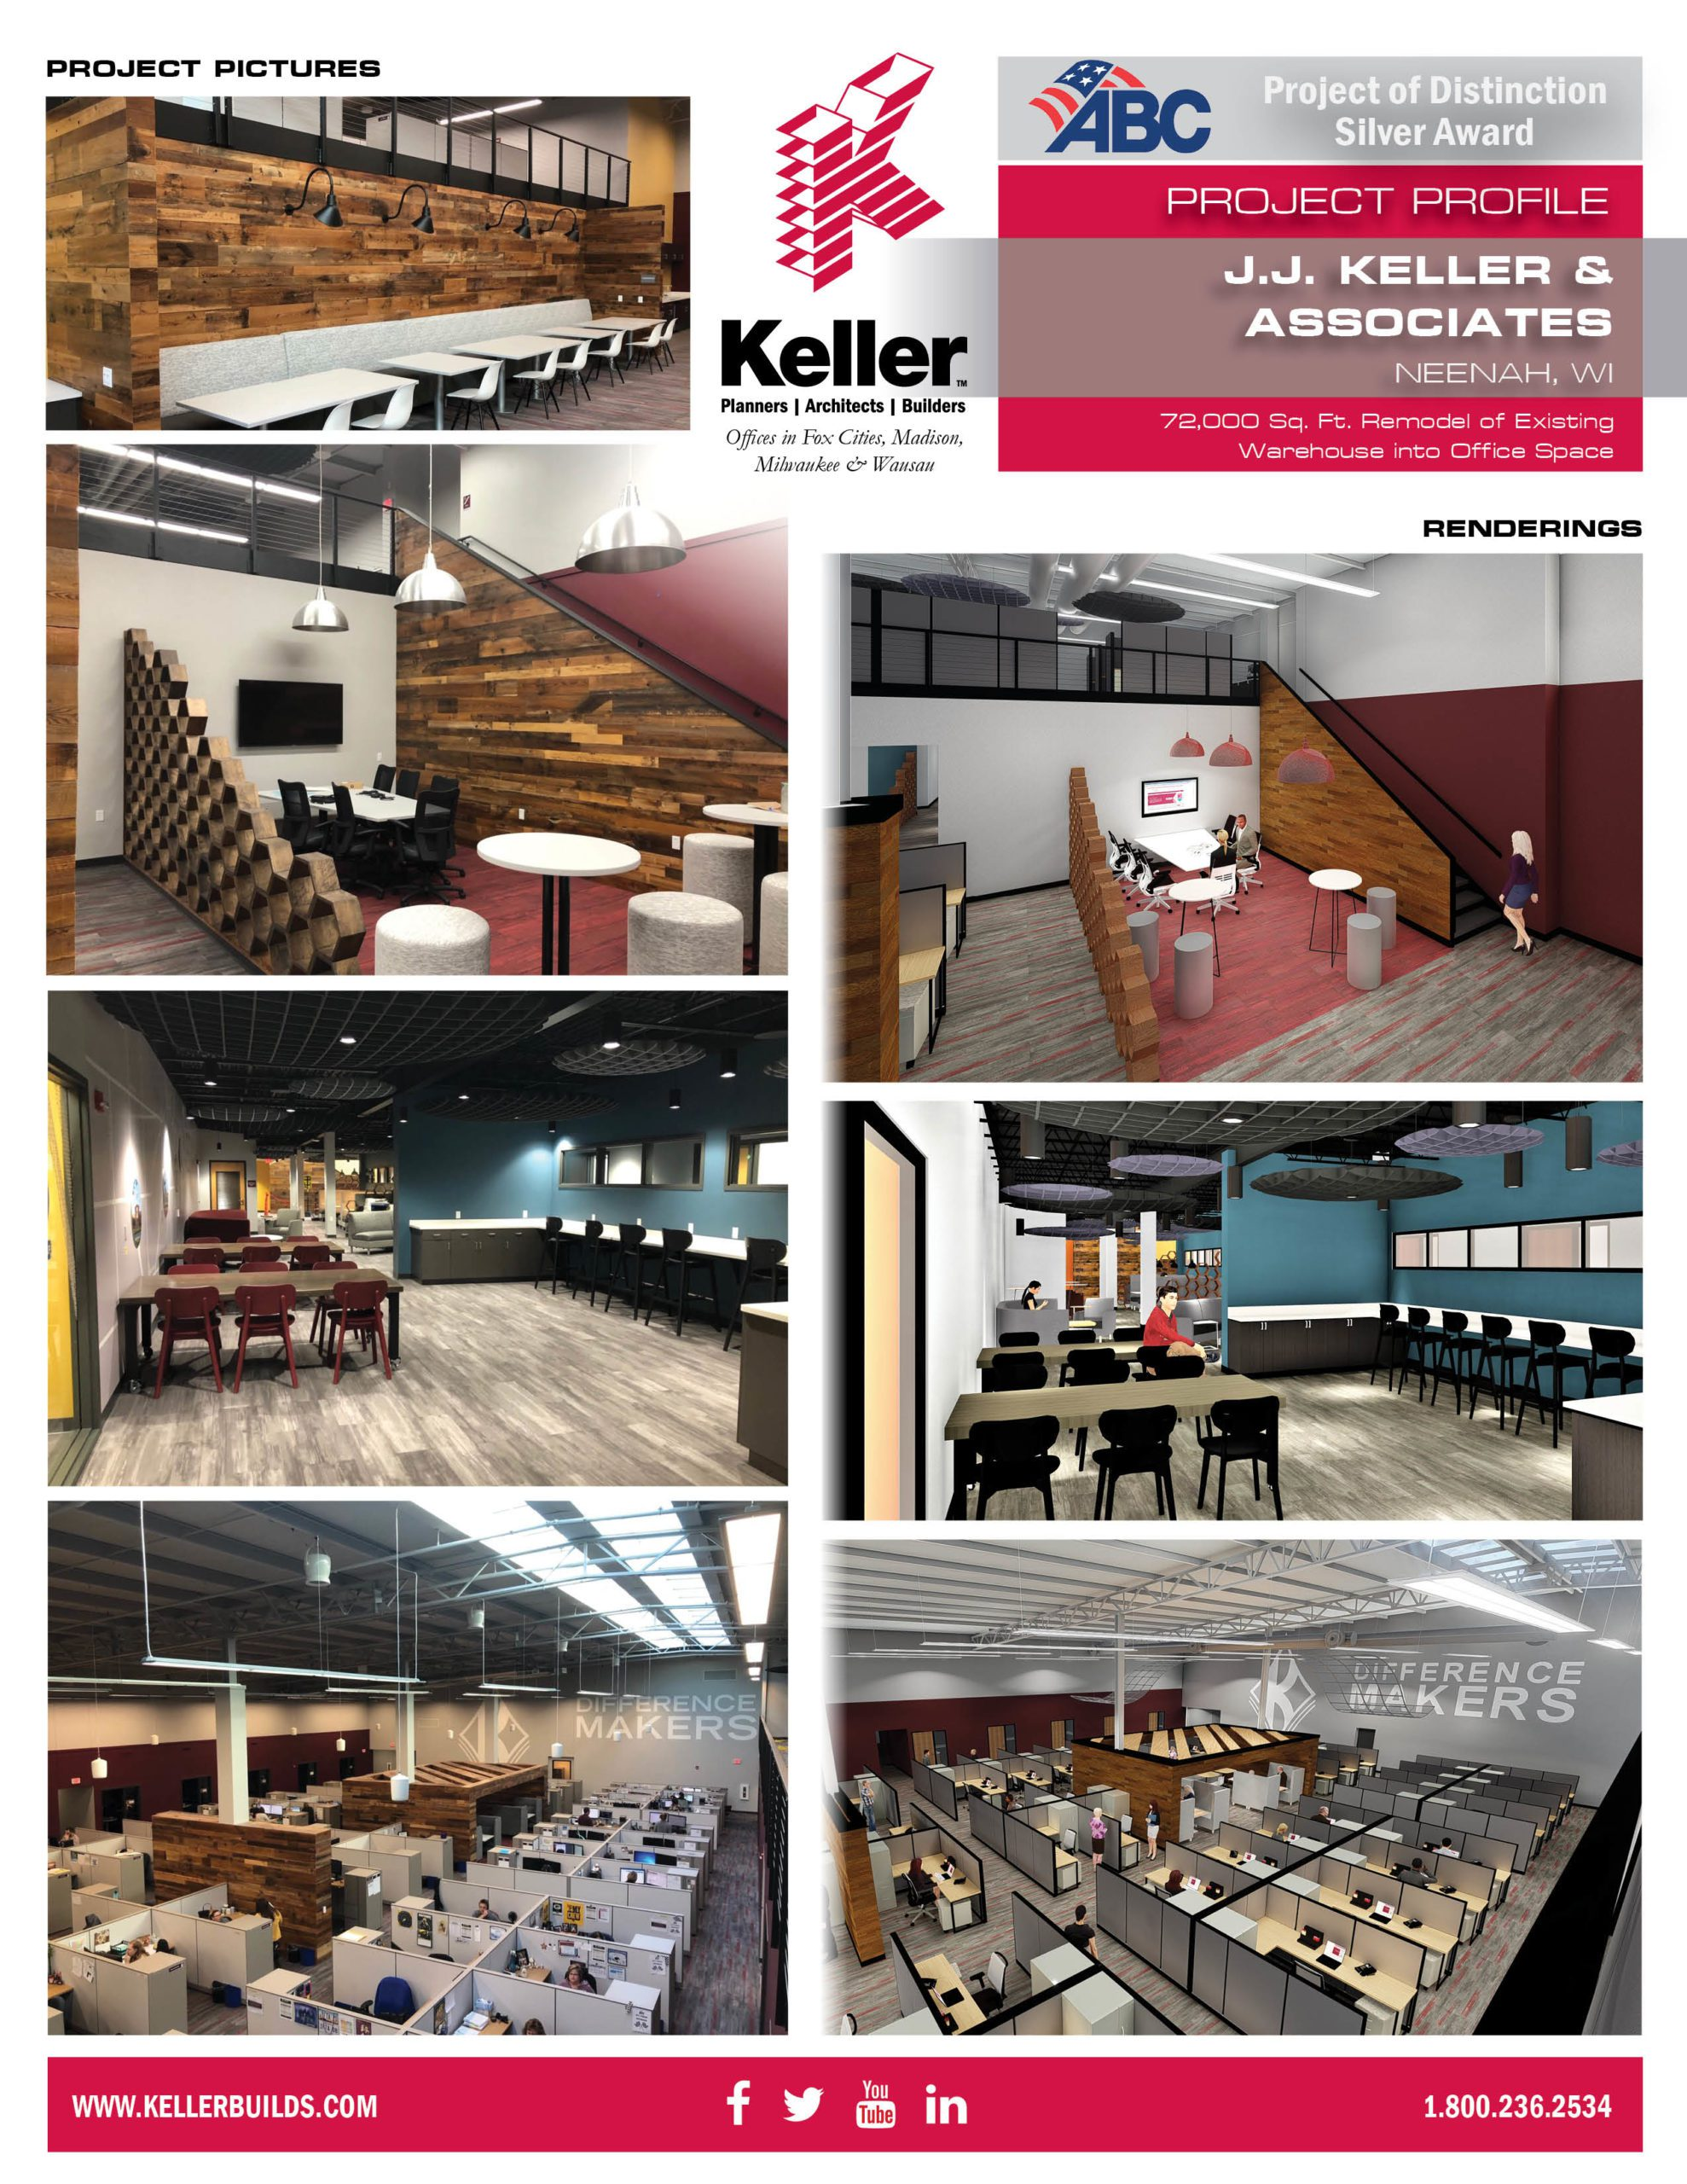 J.J. Keller & Associates